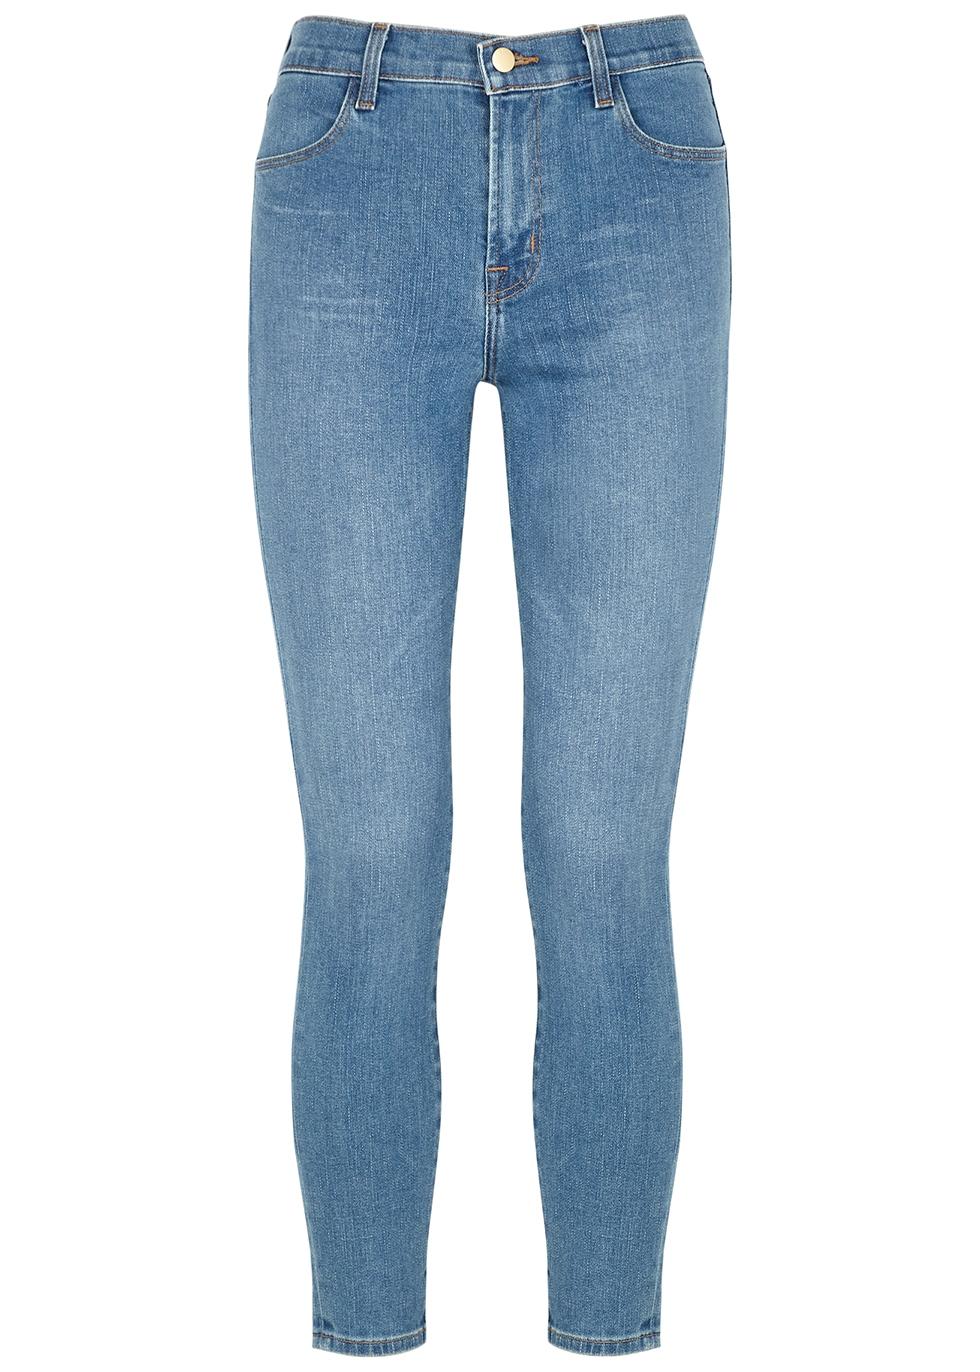 Alana blue cropped skinny jeans